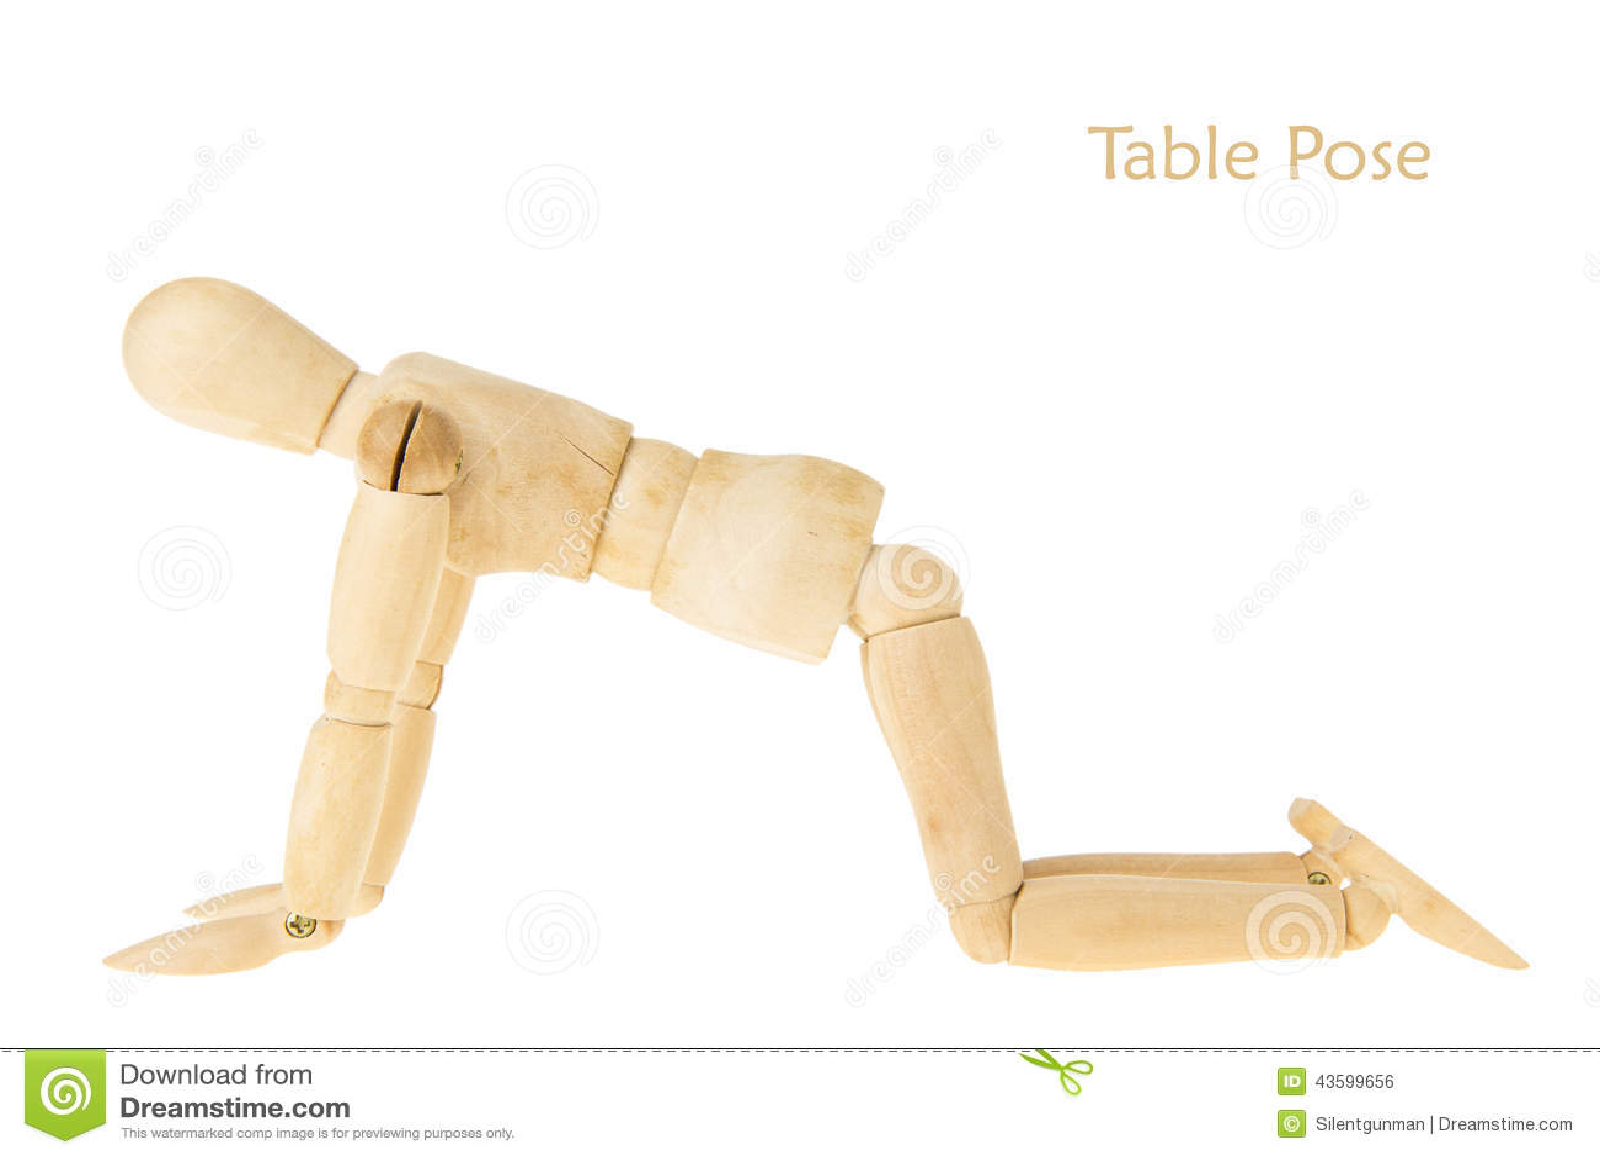 Yoga table pose stock illustration image 43599656 for Table yoga pose